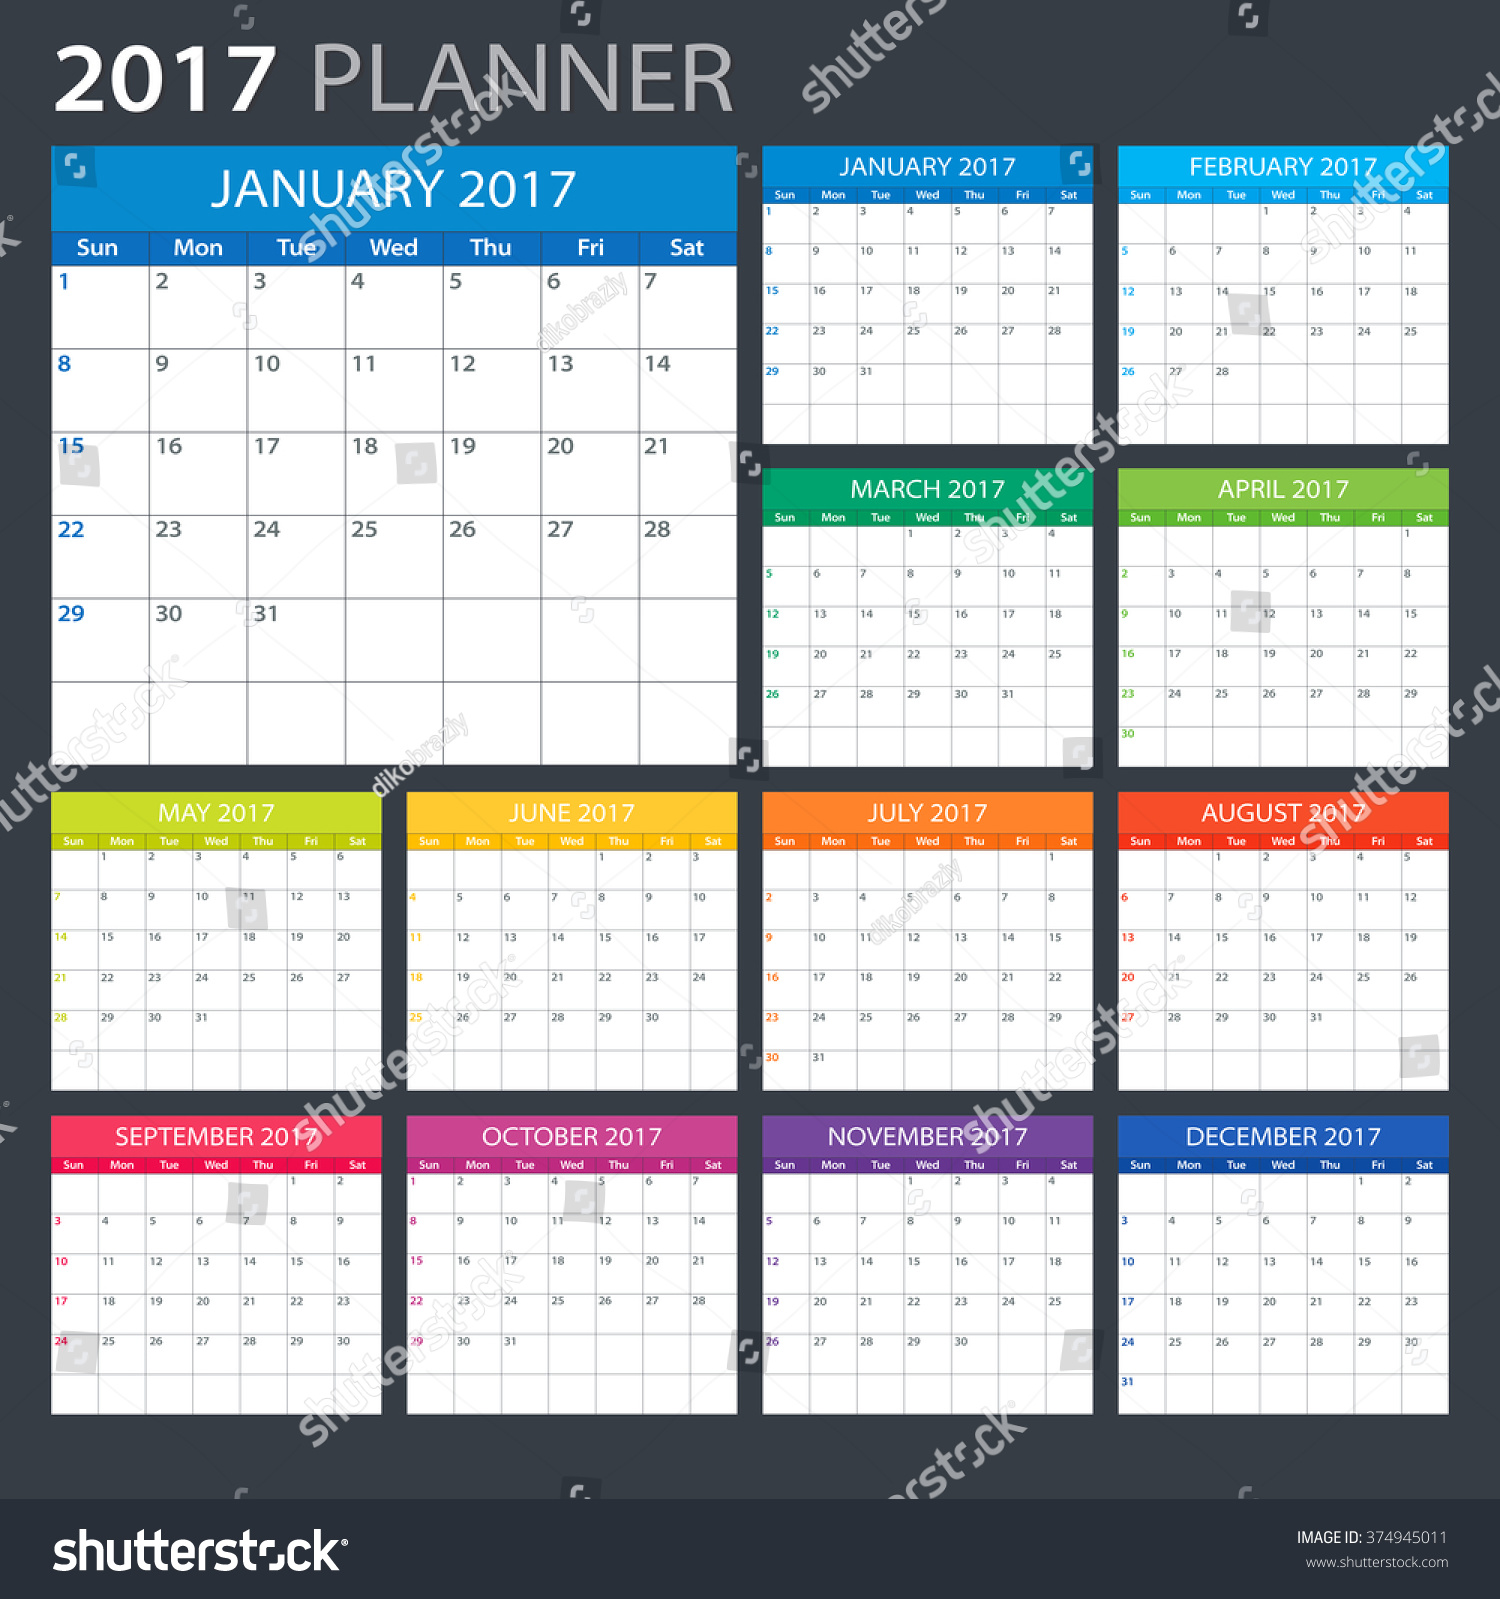 Calendar Planner Vector : Planner illustration vector template